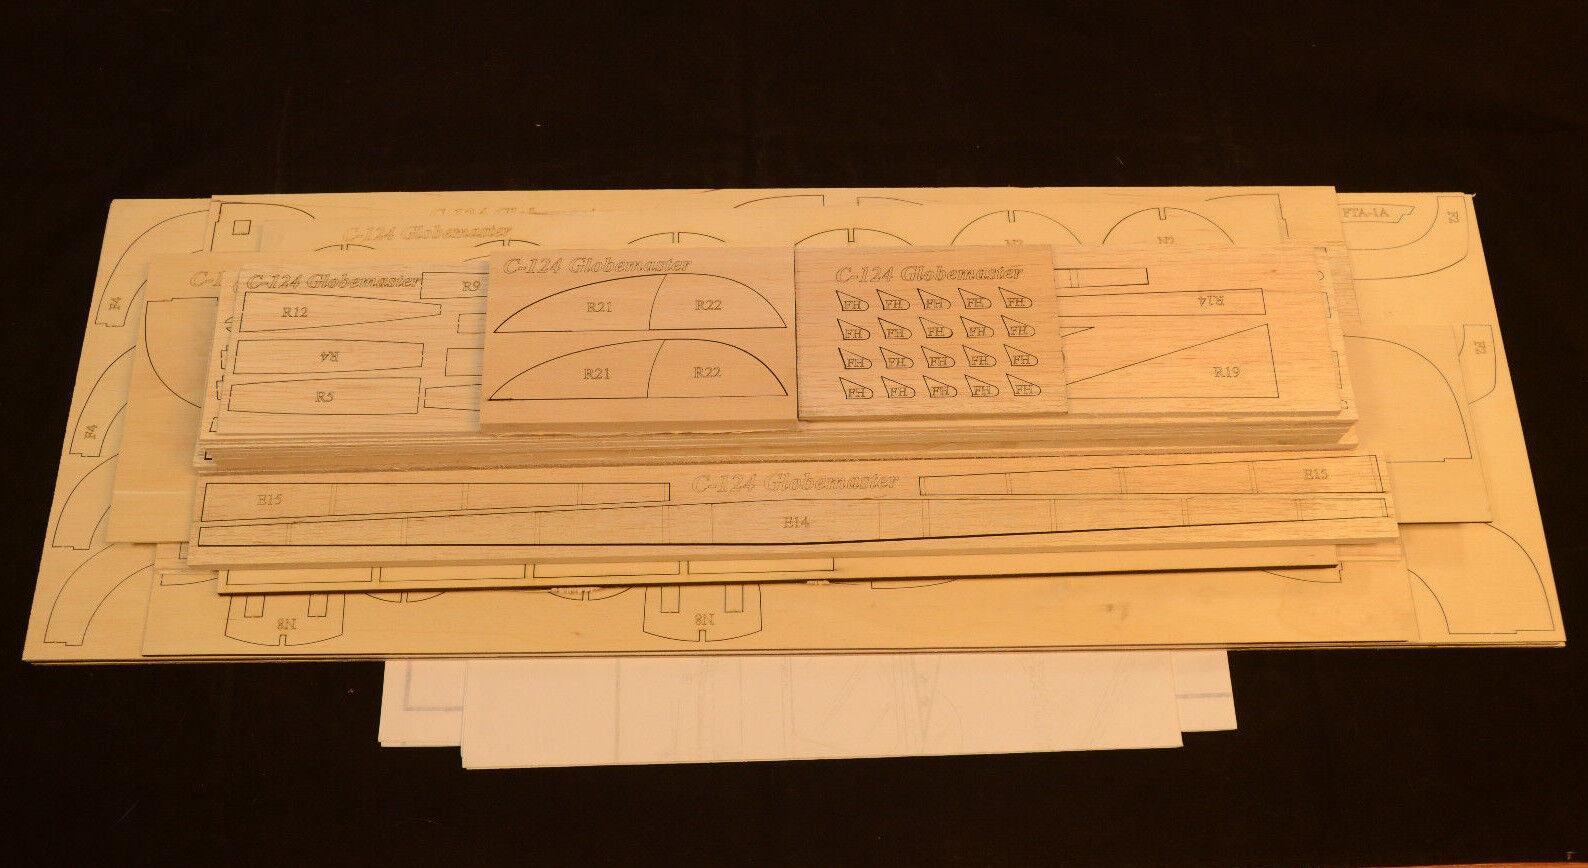 Douglas C-124 GLOBEMASTER Laser Cut Short Kit & Plans to build 87  ws R c Plane